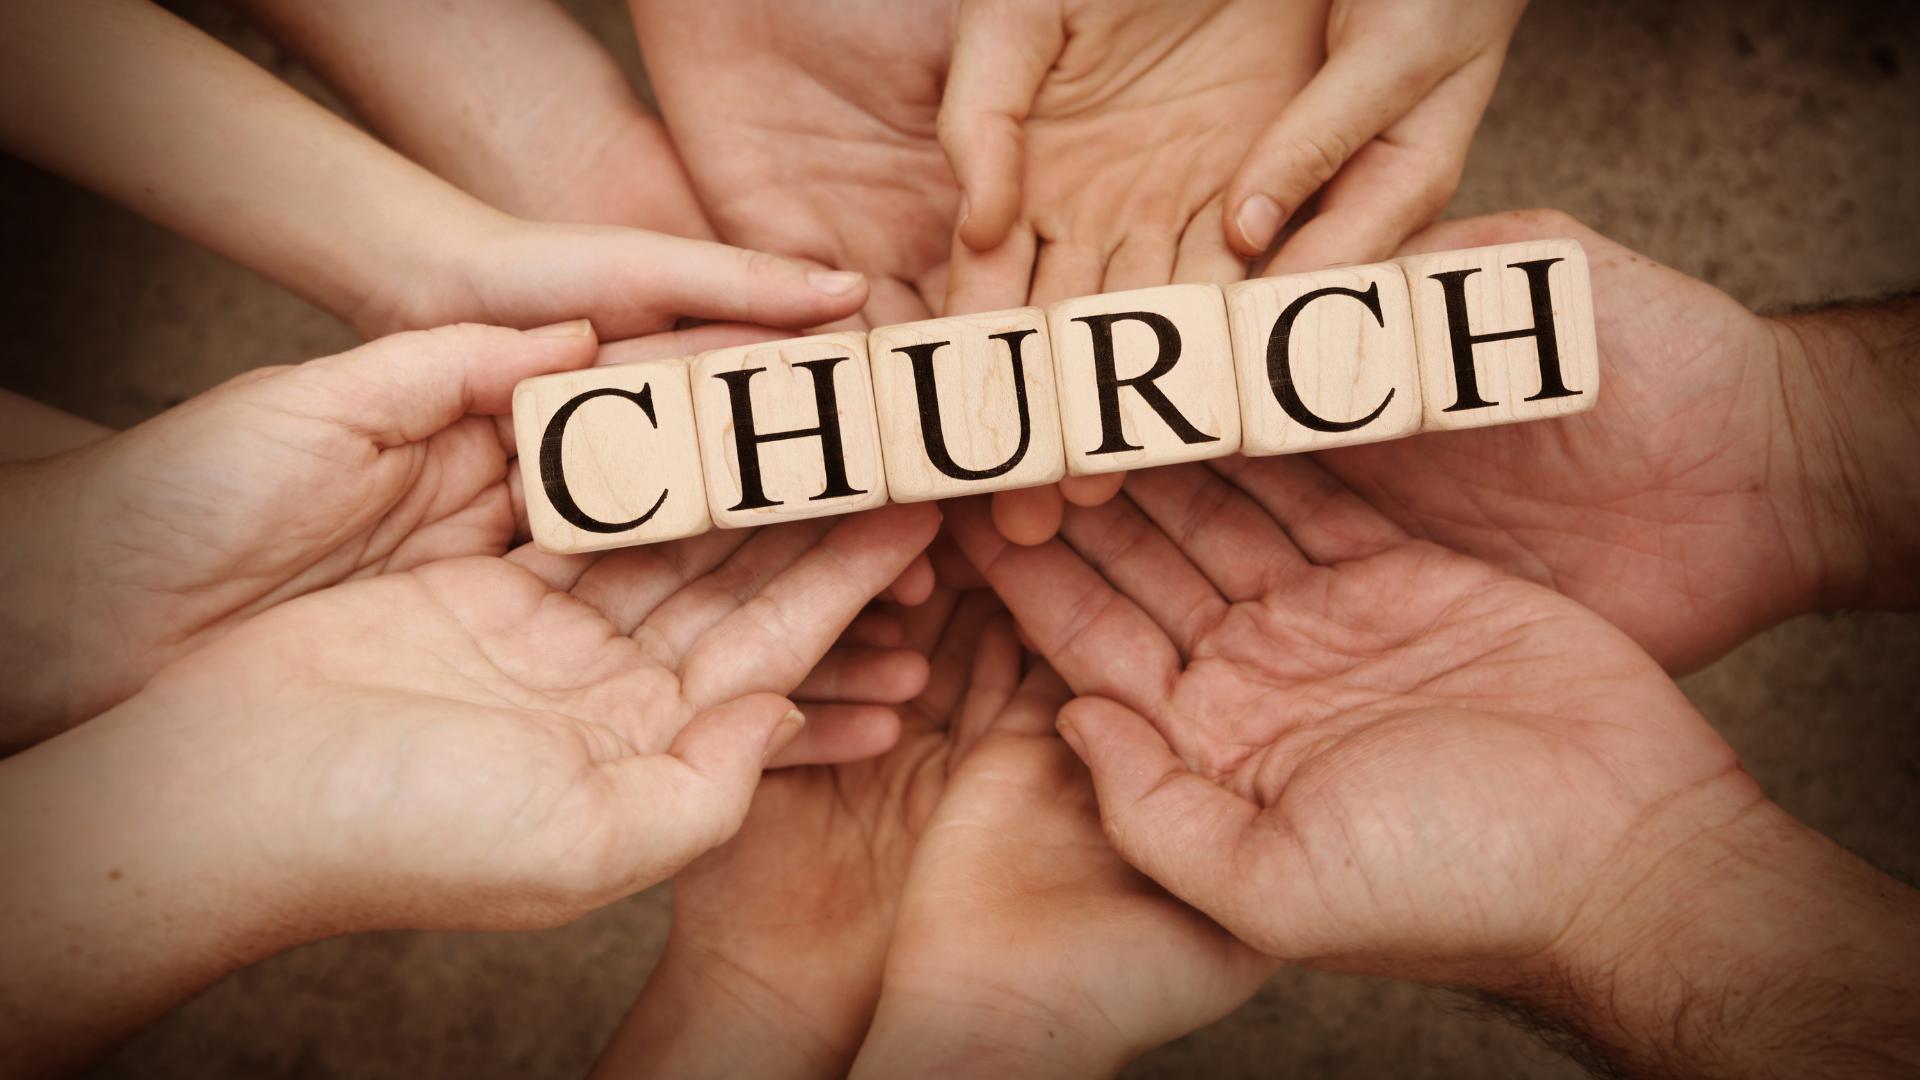 Pertencer à família (igreja) e cuidar dela